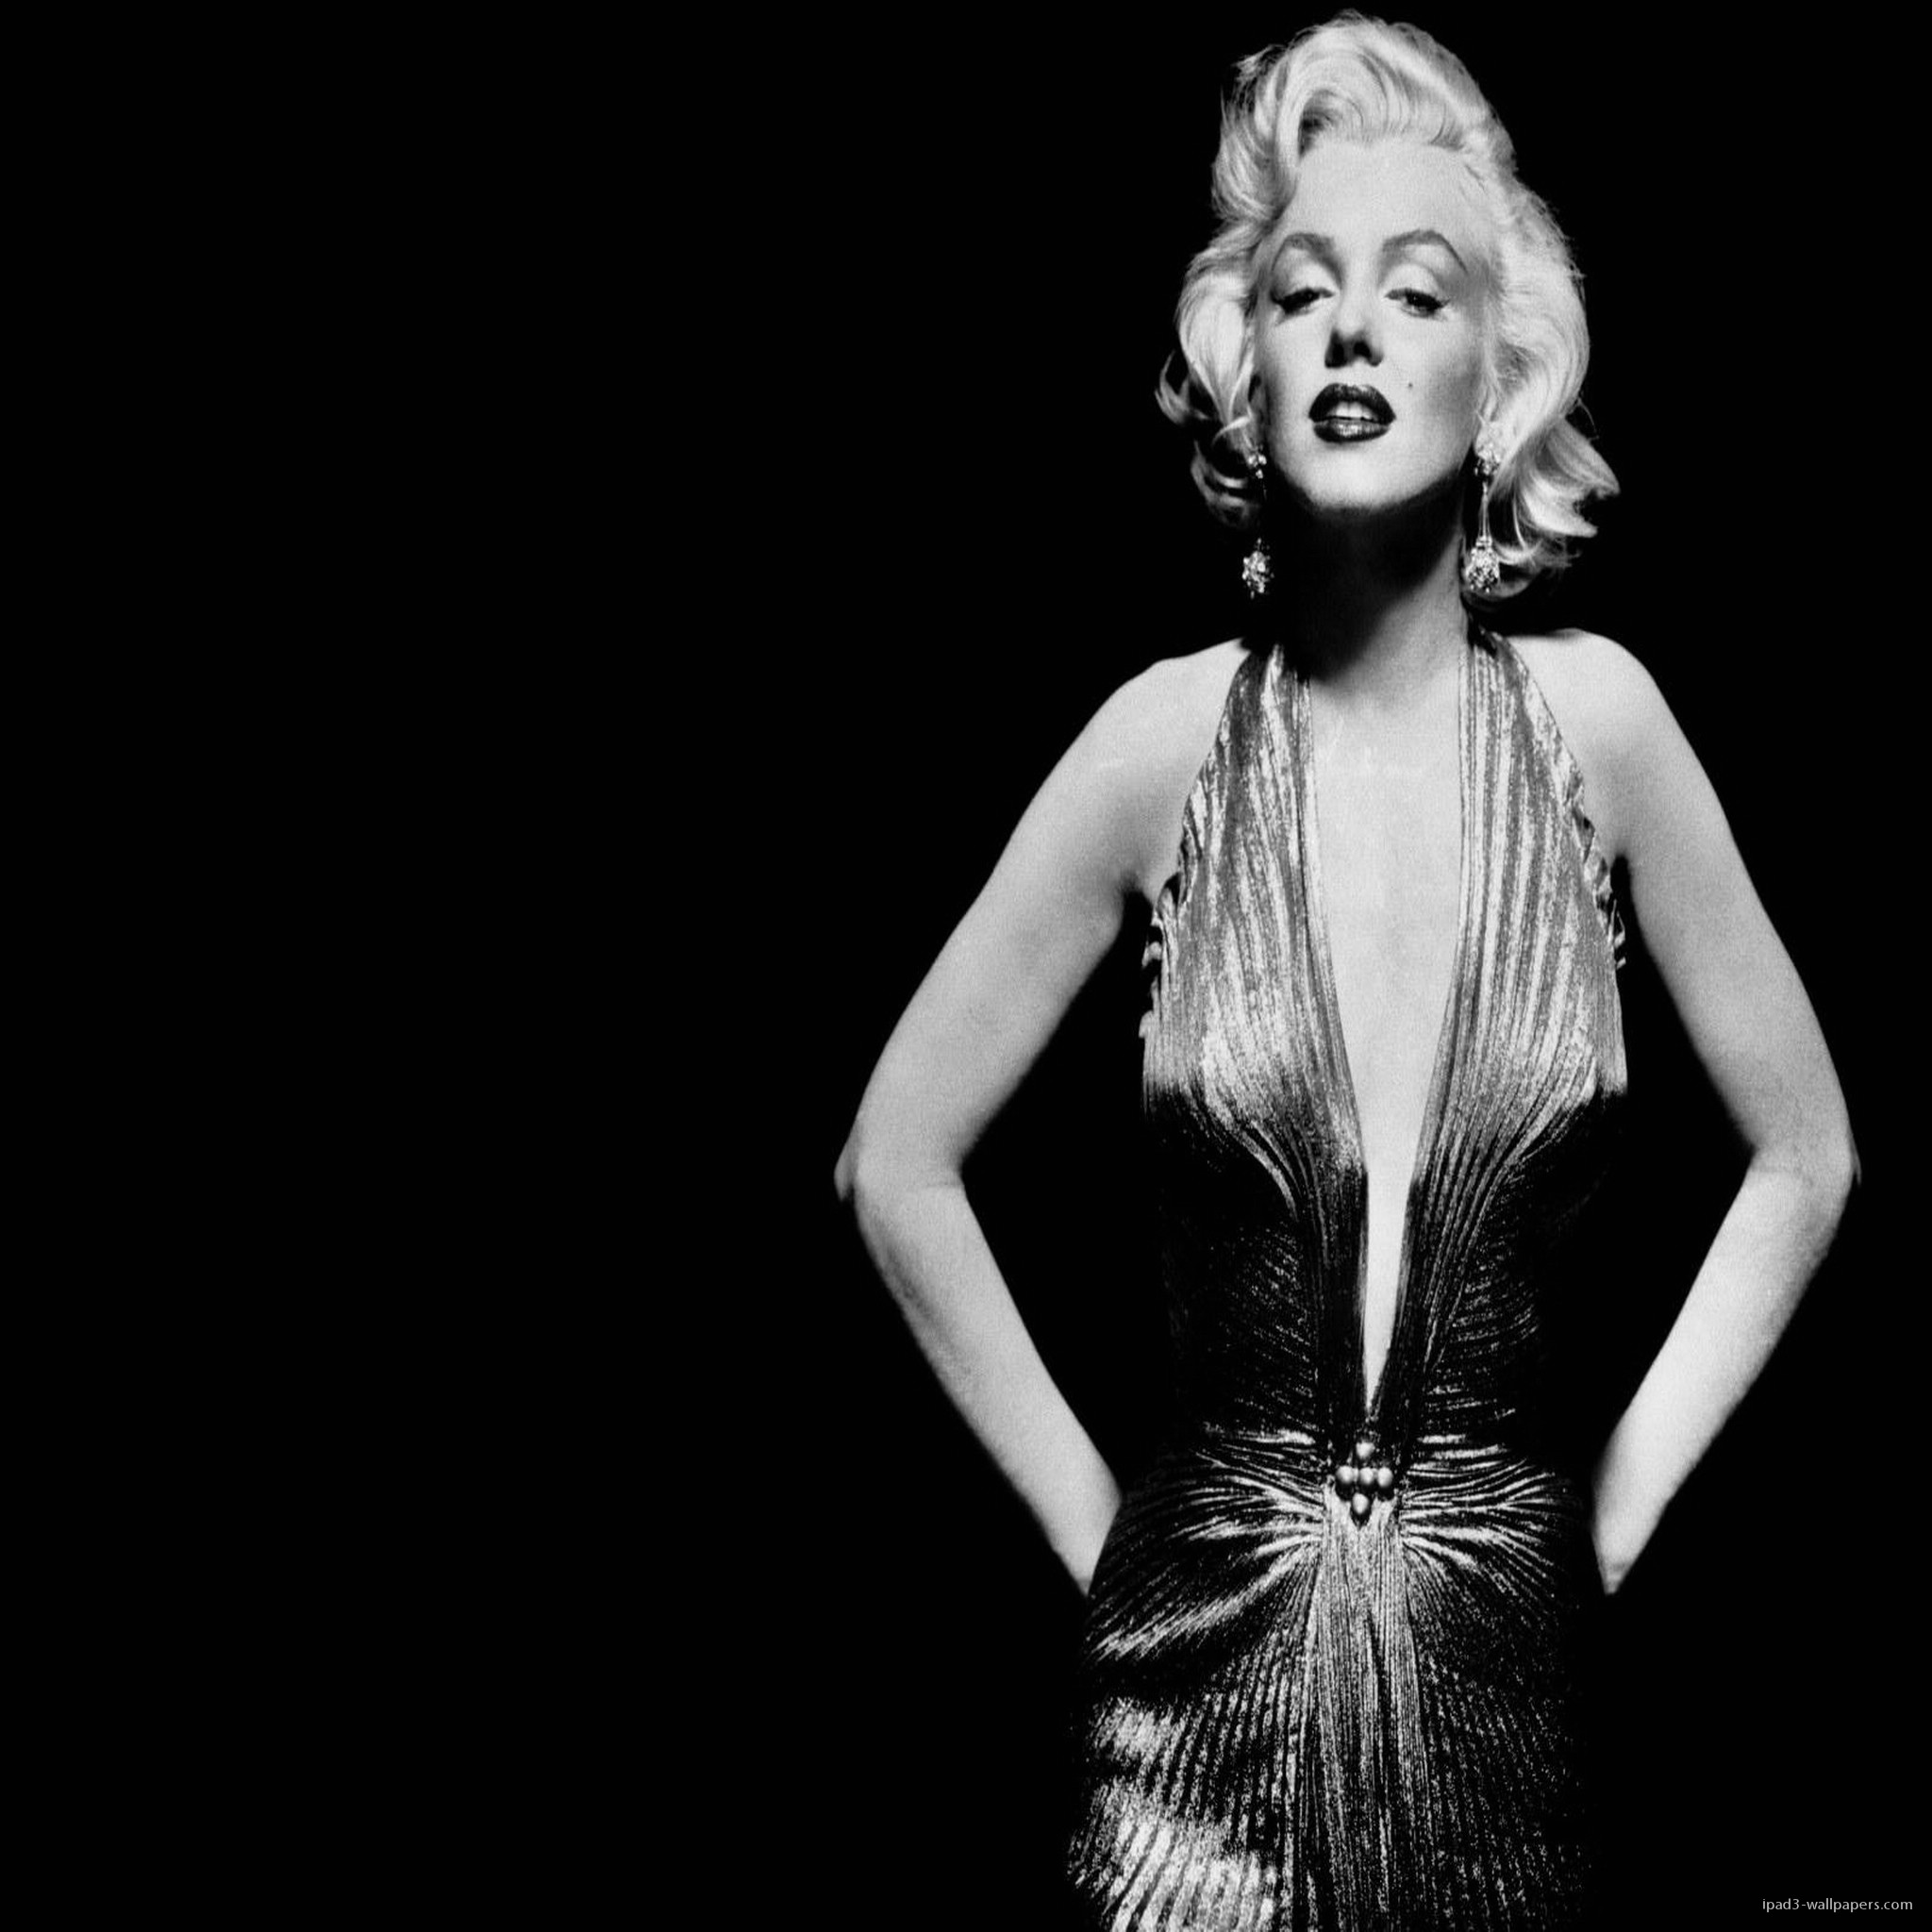 Citaten Marilyn Monroe Hd : Marilyn monroe hd wallpaper wallpapersafari